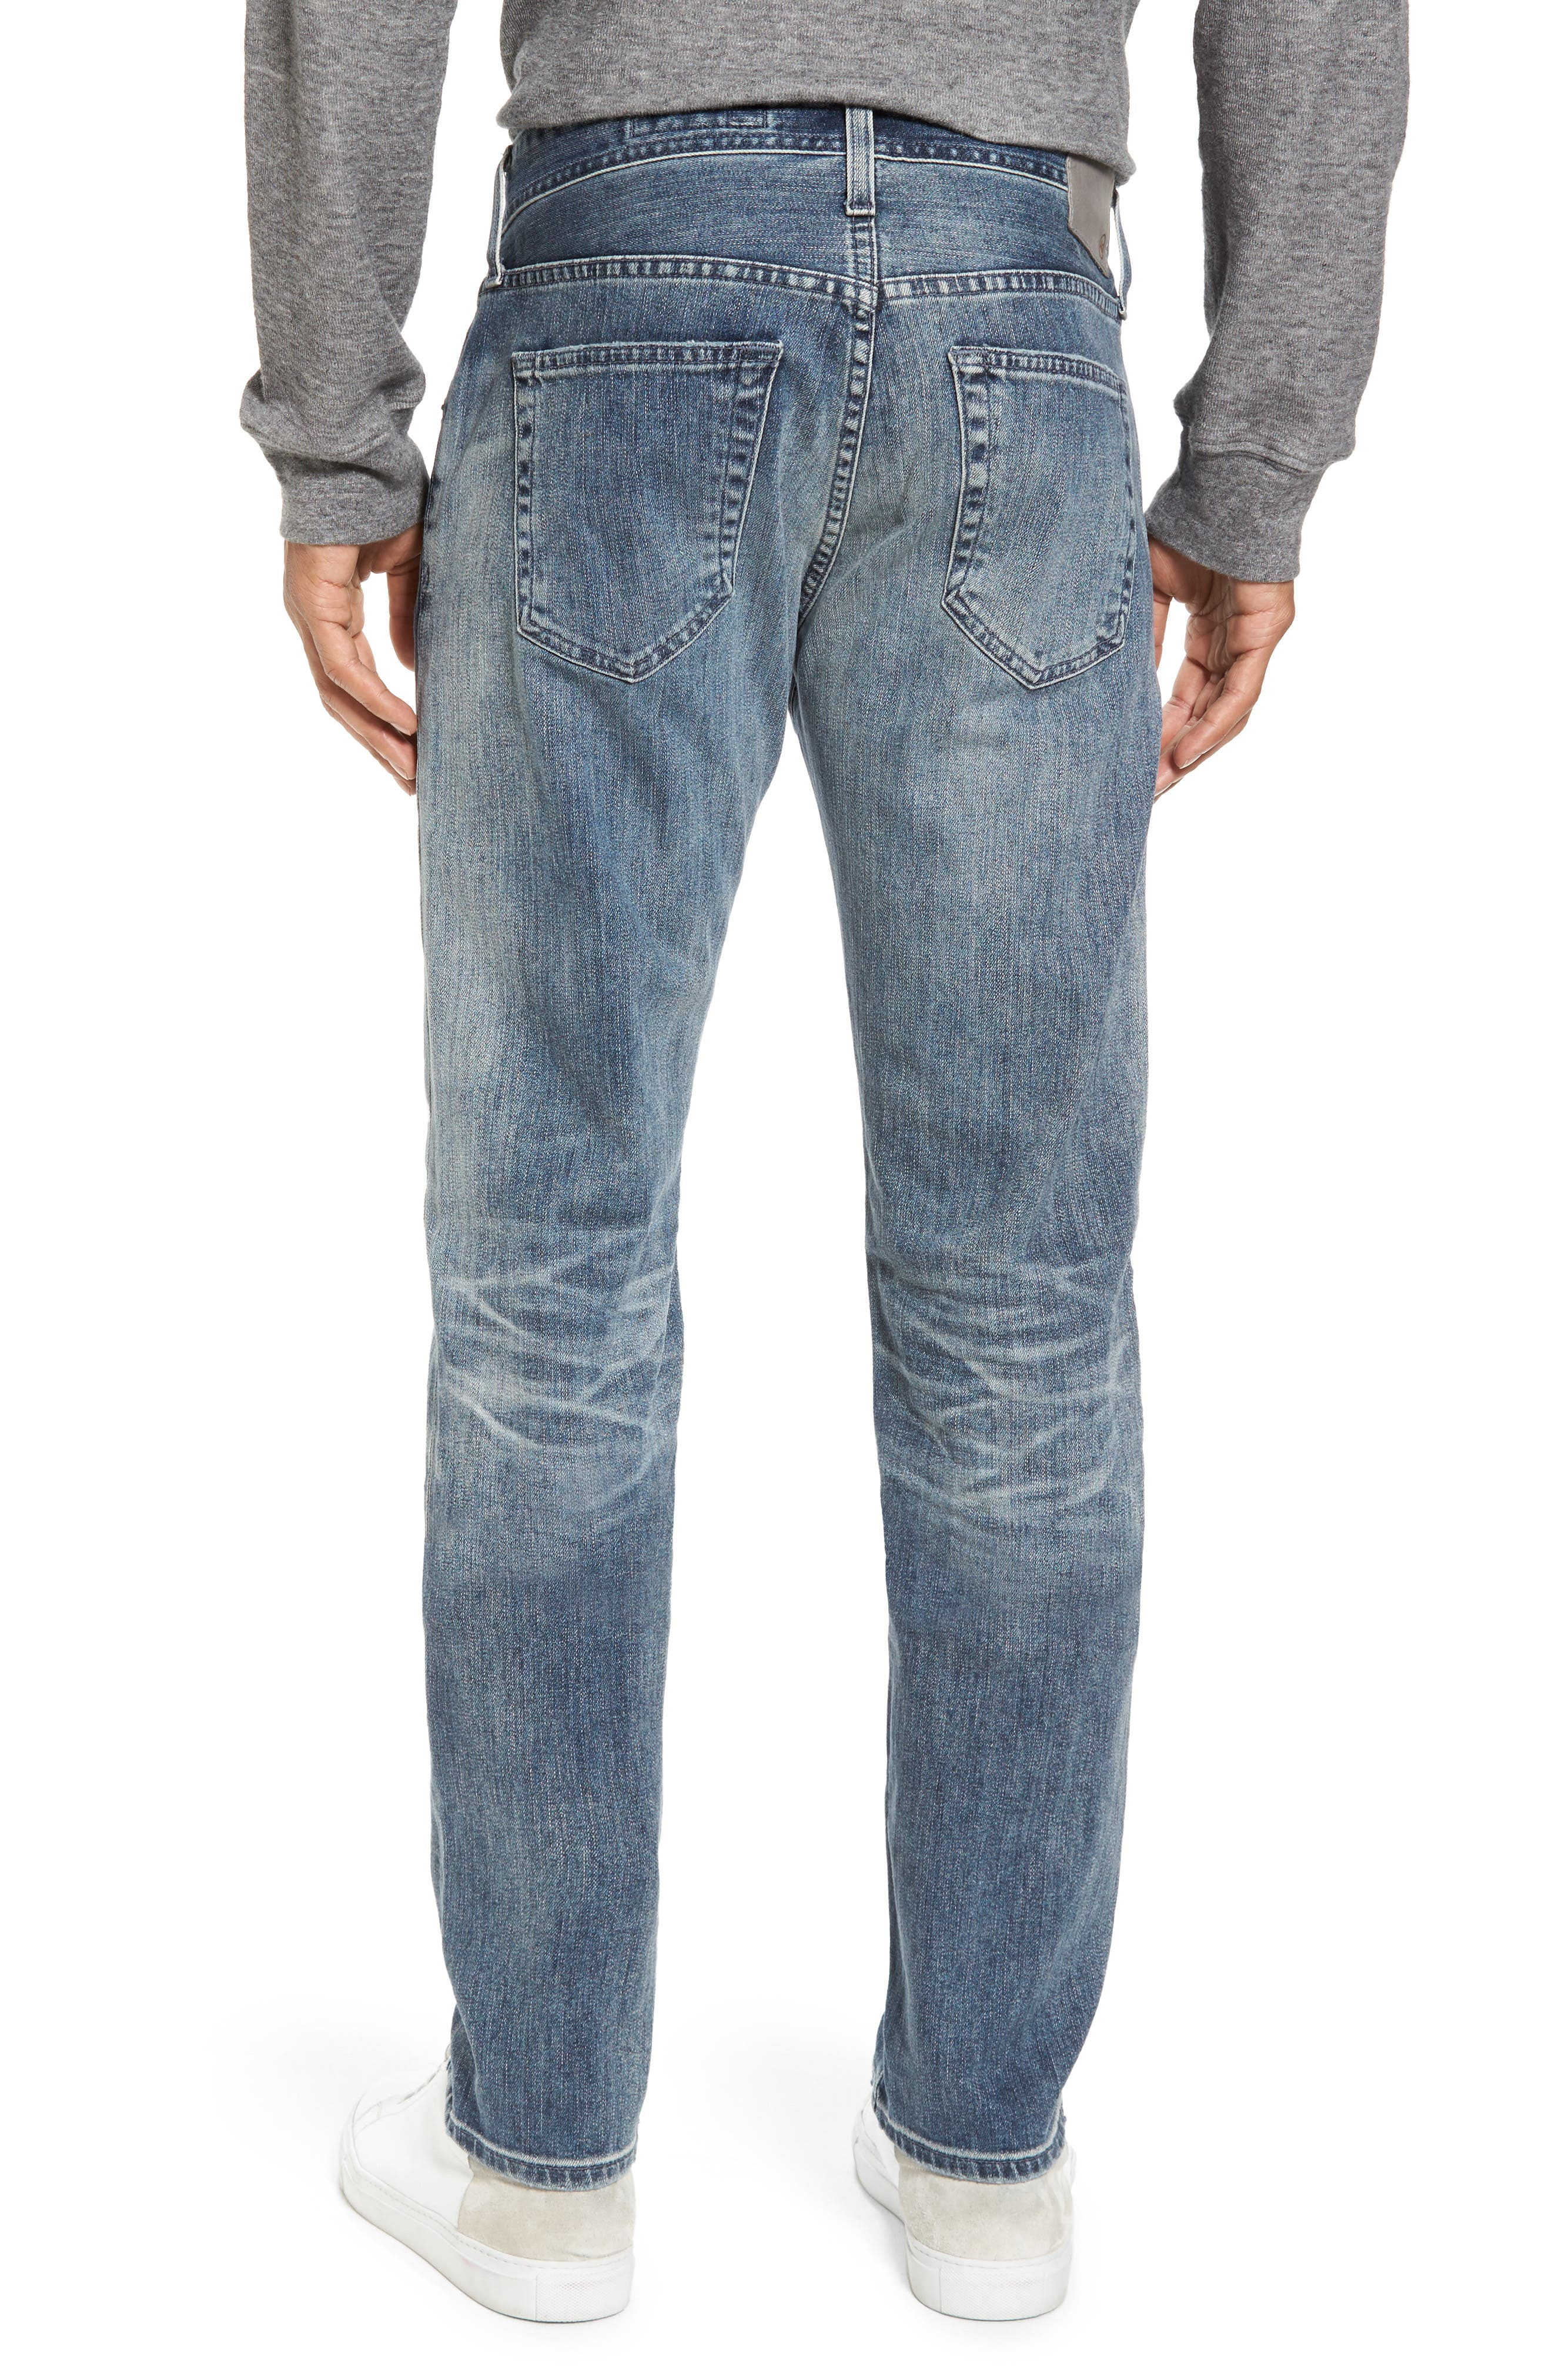 Tellis Slim Fit Jeans,                             Alternate thumbnail 2, color,                             487